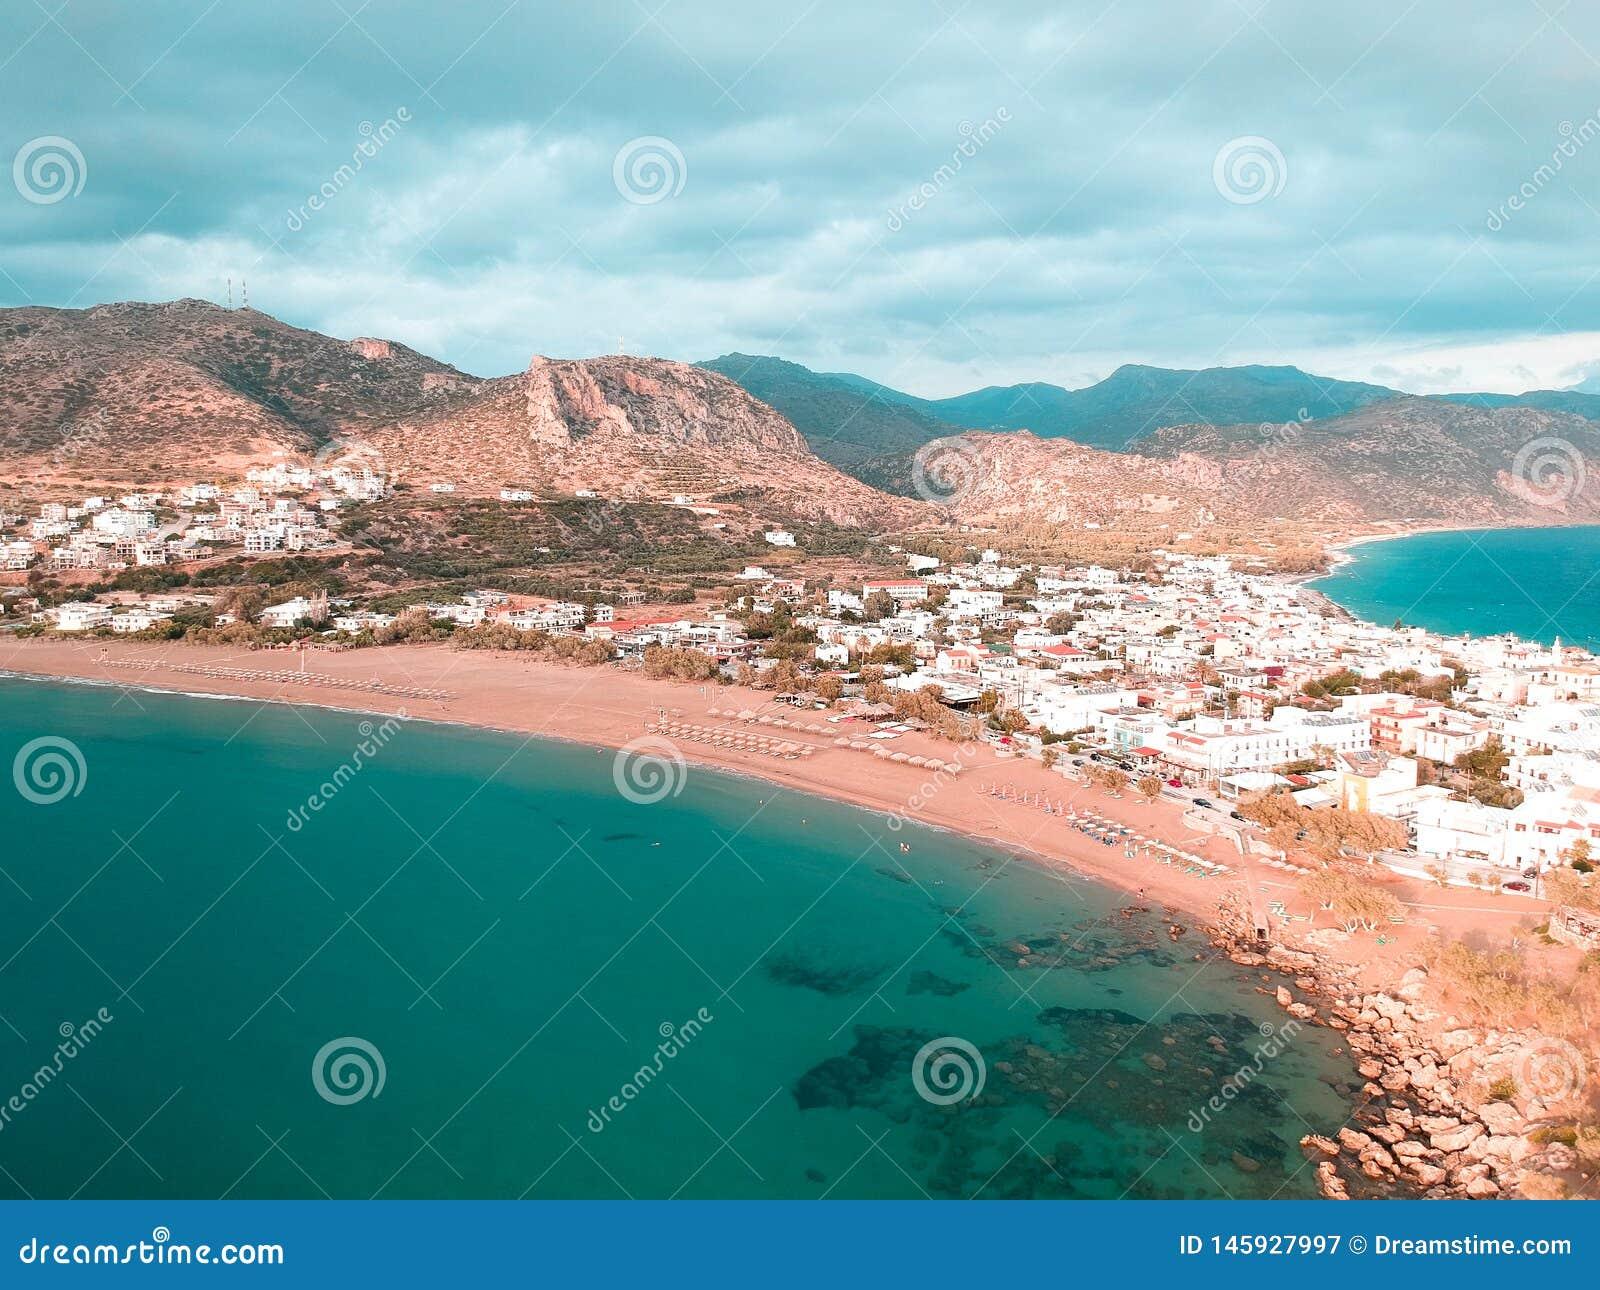 Panoramische hommelmening van kleine stad in Griekenland geroepen Paleochora